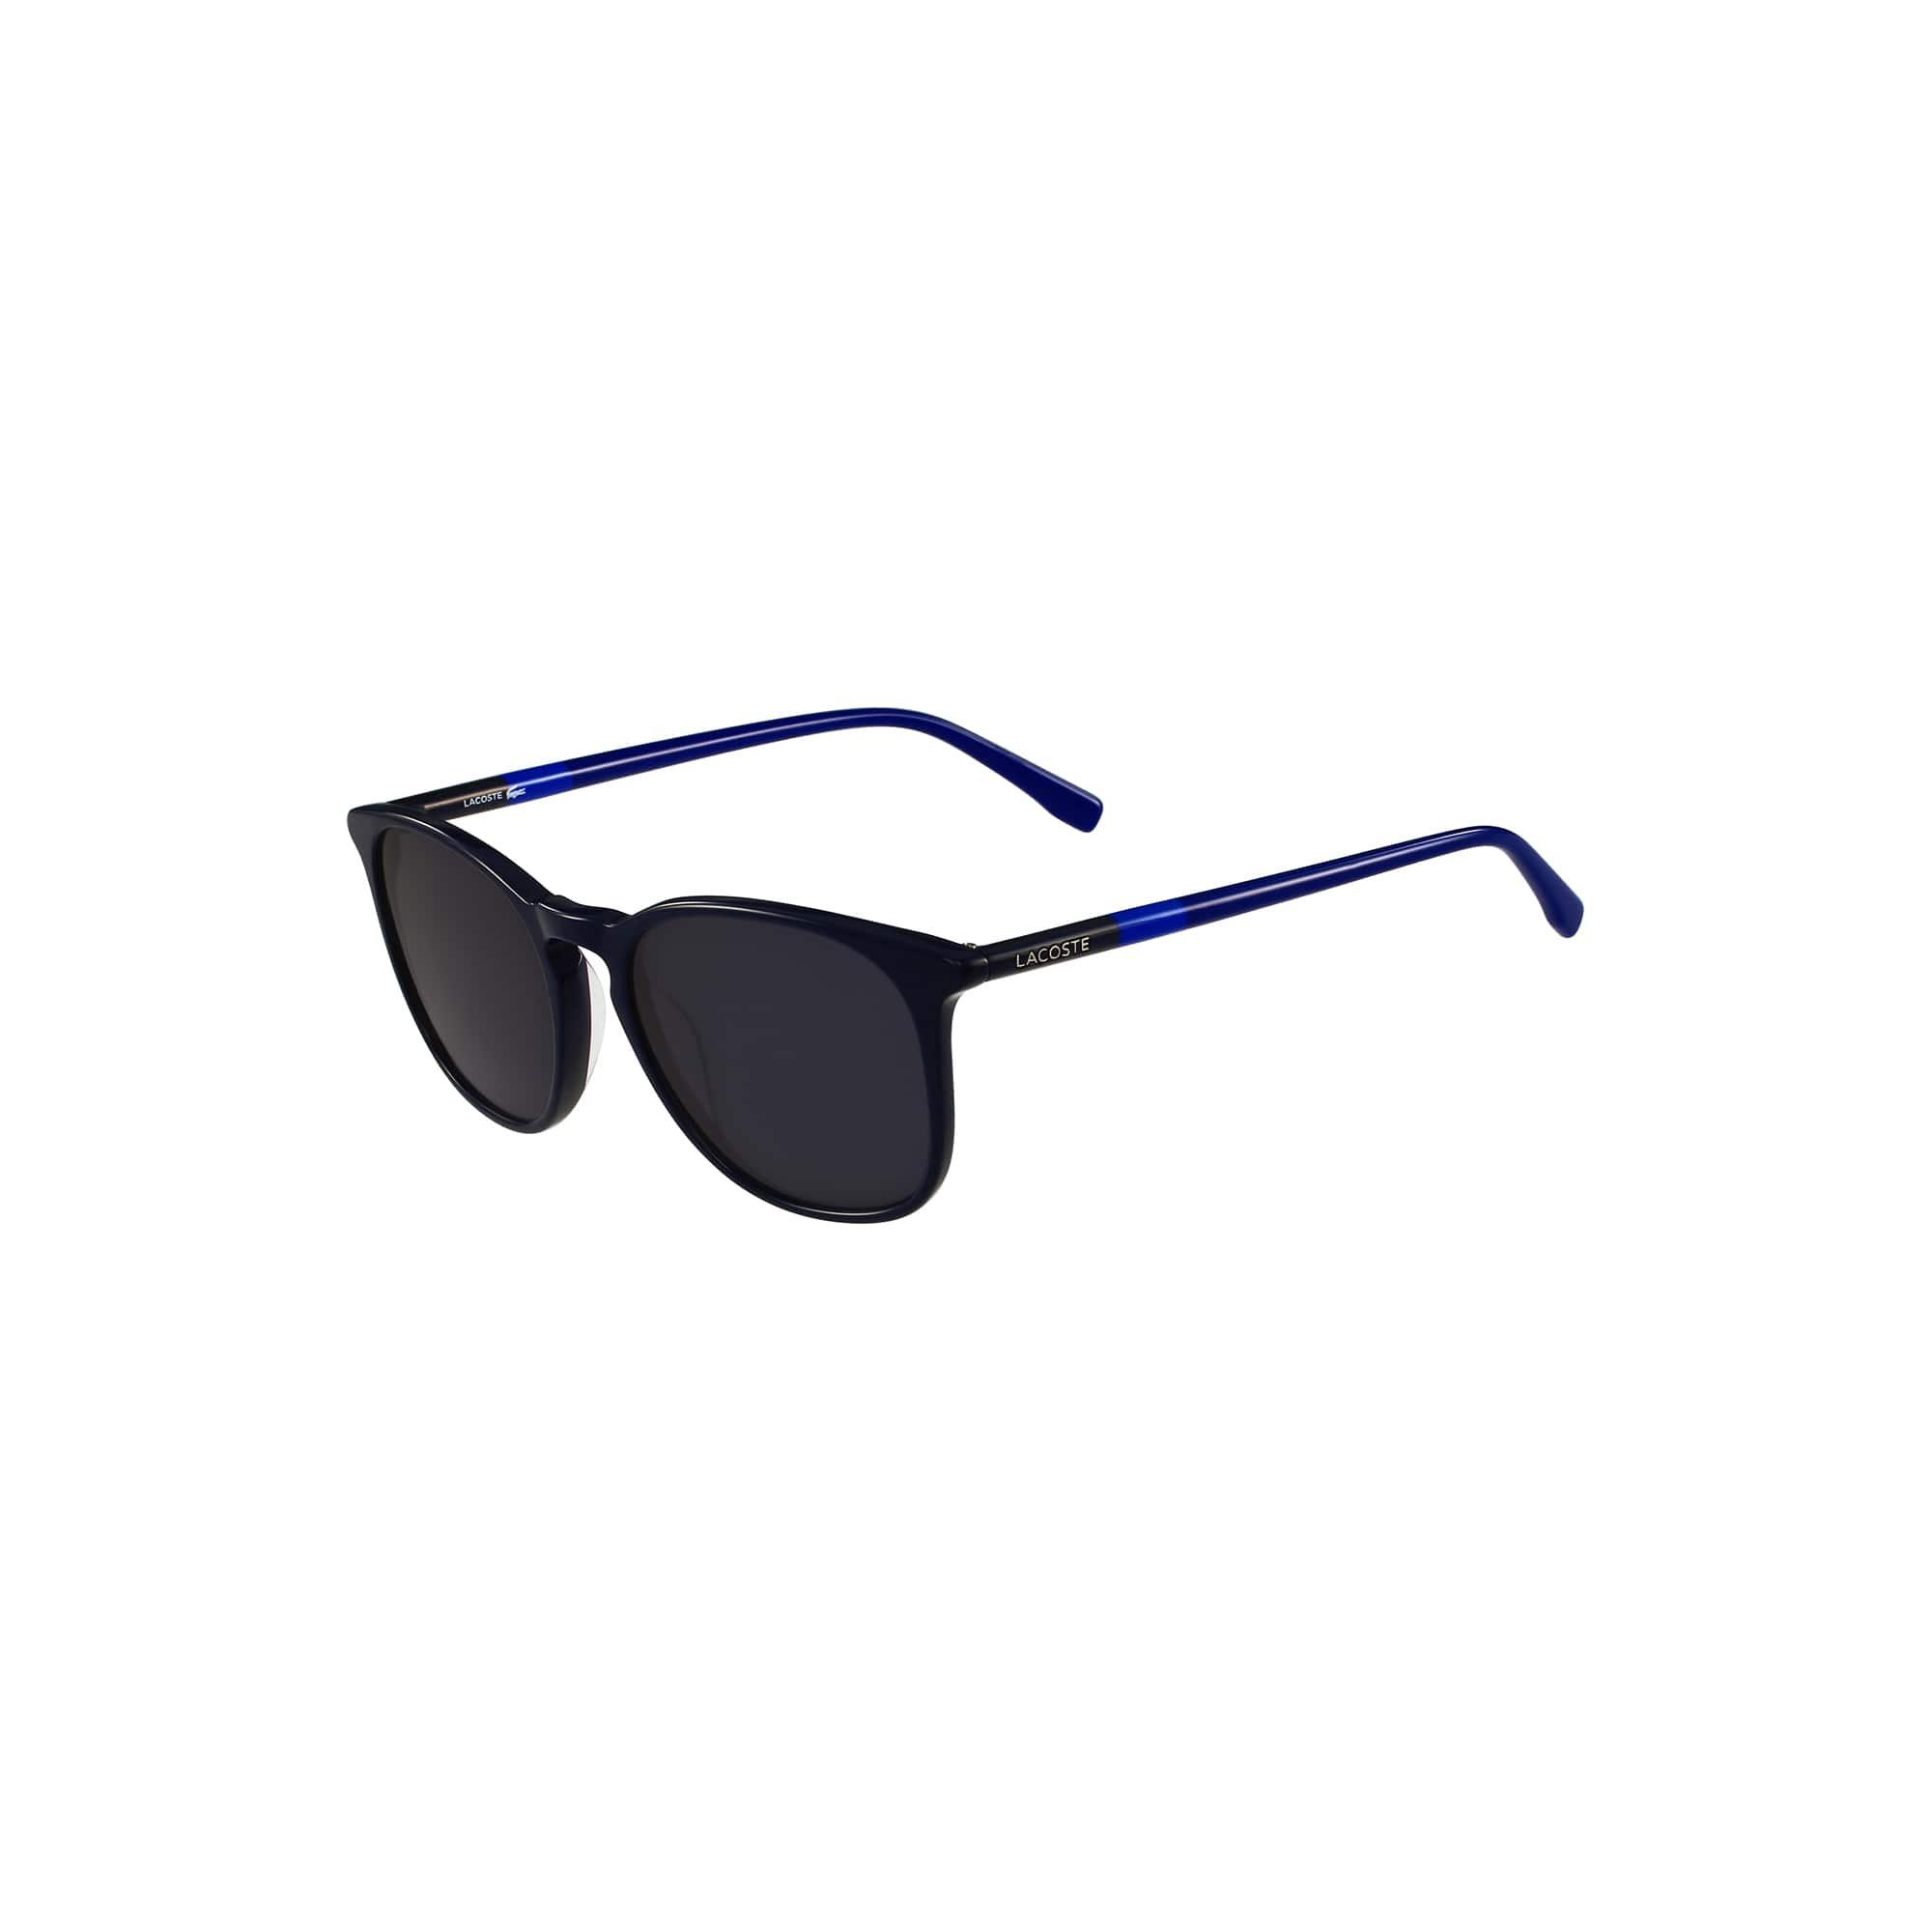 5420e39519c Sunglasses for Women